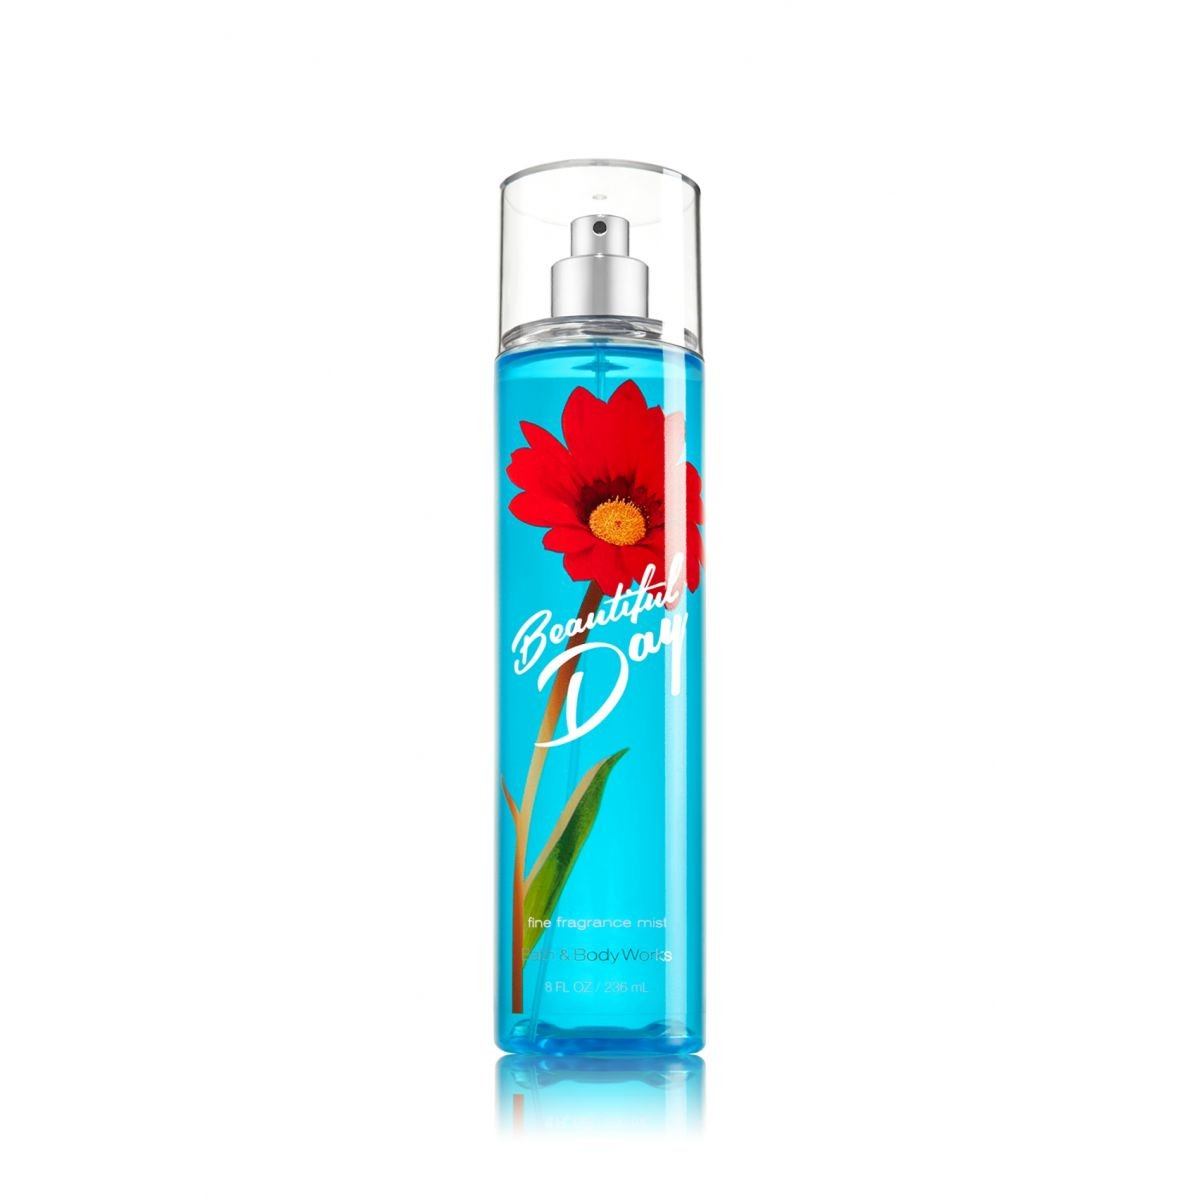 Bath and Body Works Fine Fragrance Beautiful Day, 8.0 Fl Oz Bath & Body Works 667531938075